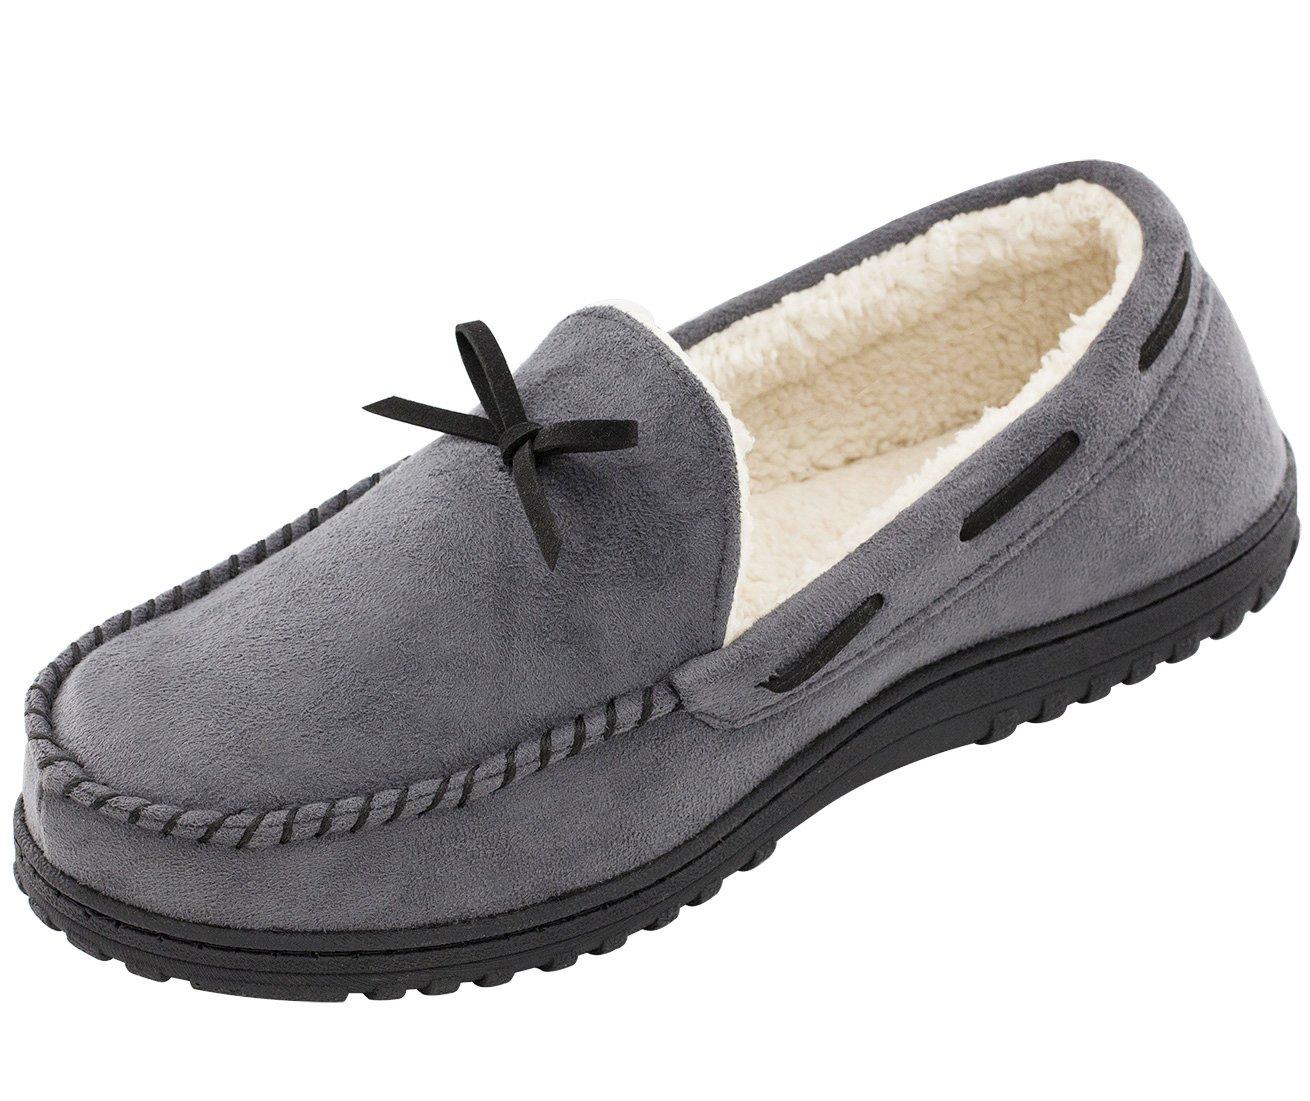 eabbc422bf RockDove Men's Wool Lined Micro Suede Memory Foam Moccasin Slipper ...